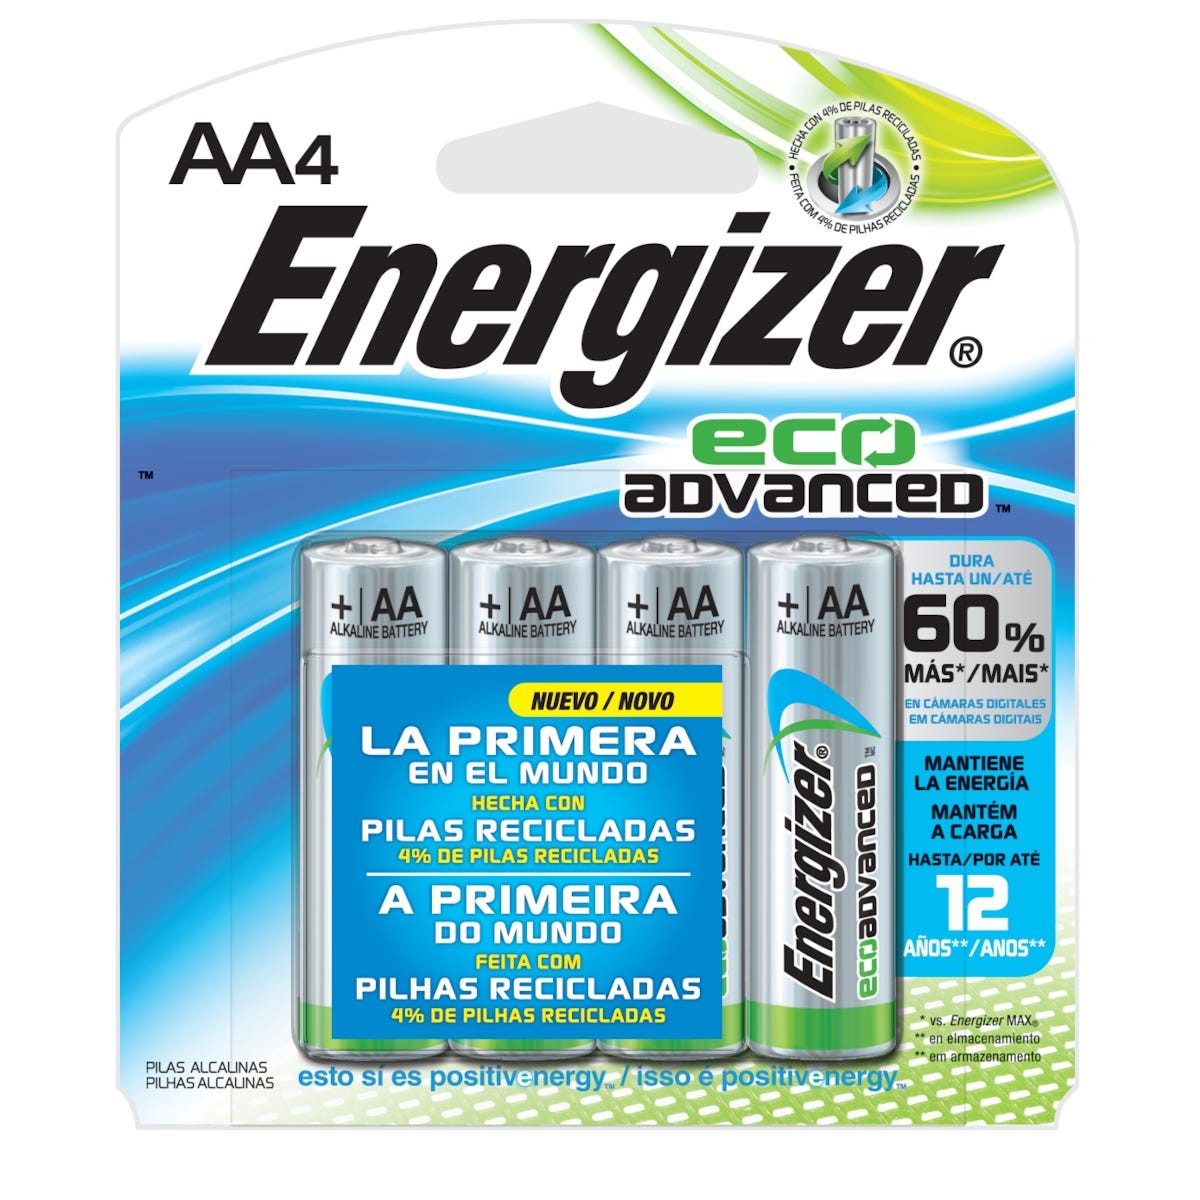 Pila alcalina Energizer Eco-Advance® AA, paquete de 4